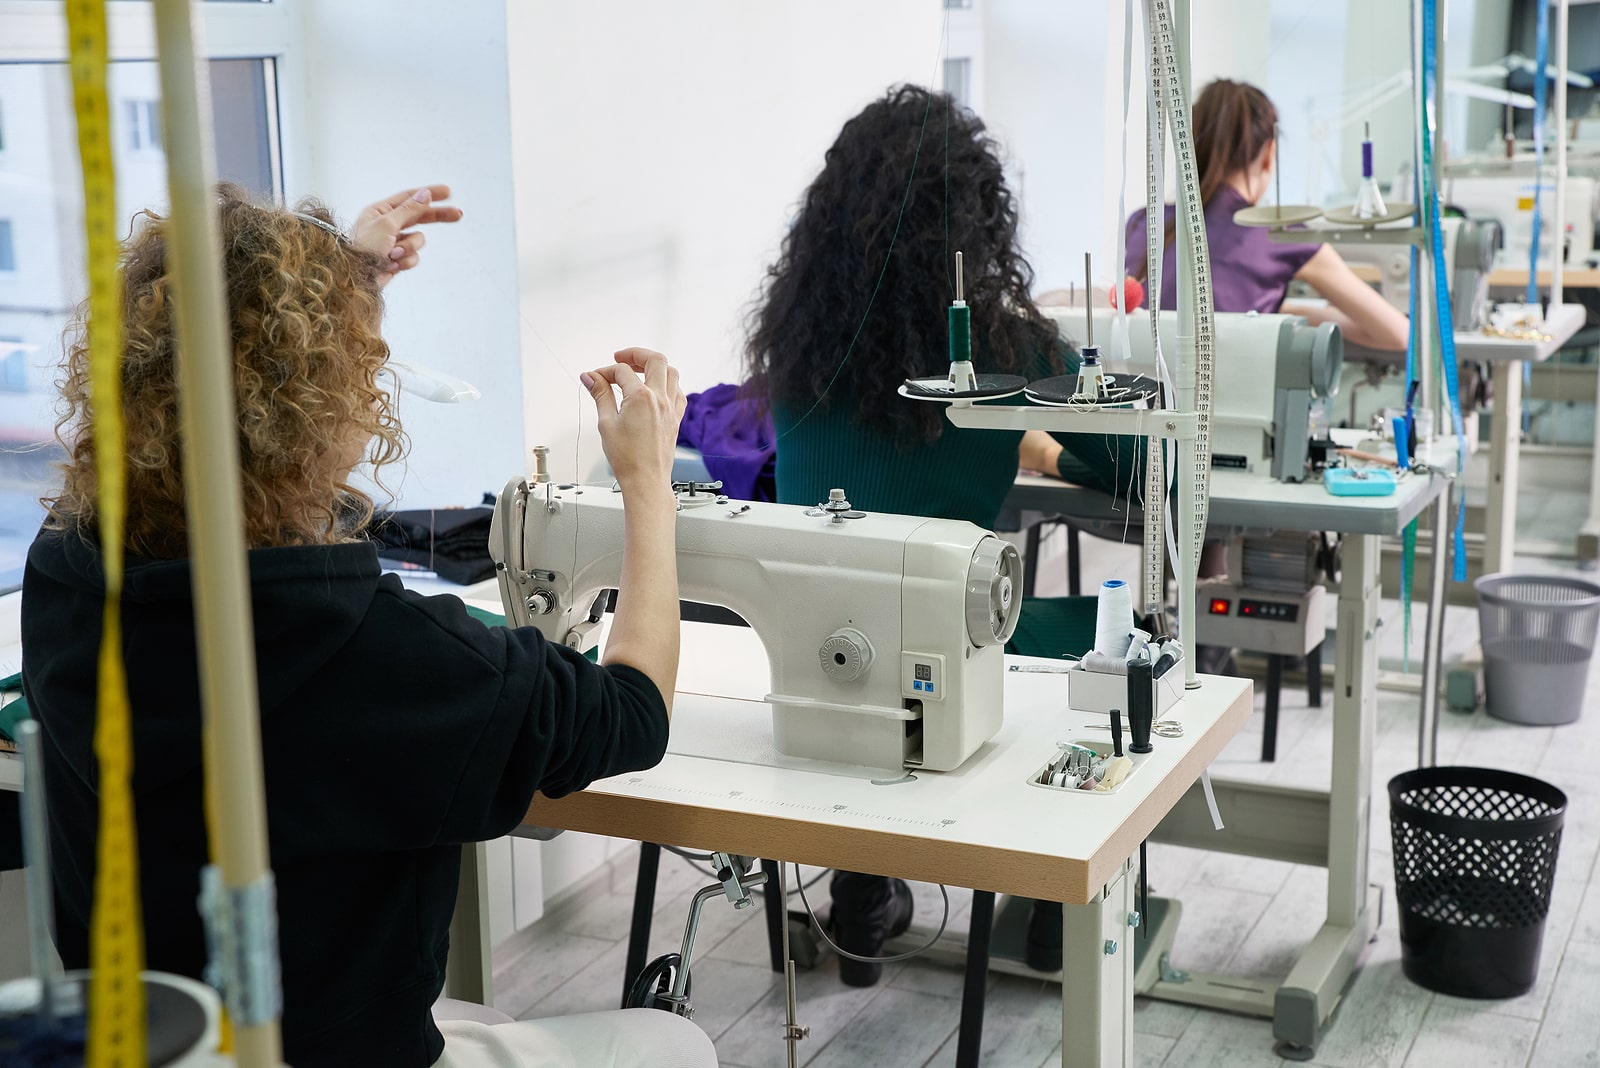 bigstock-Young-Dressmaker-Women-Sew-Clo-347122285-min